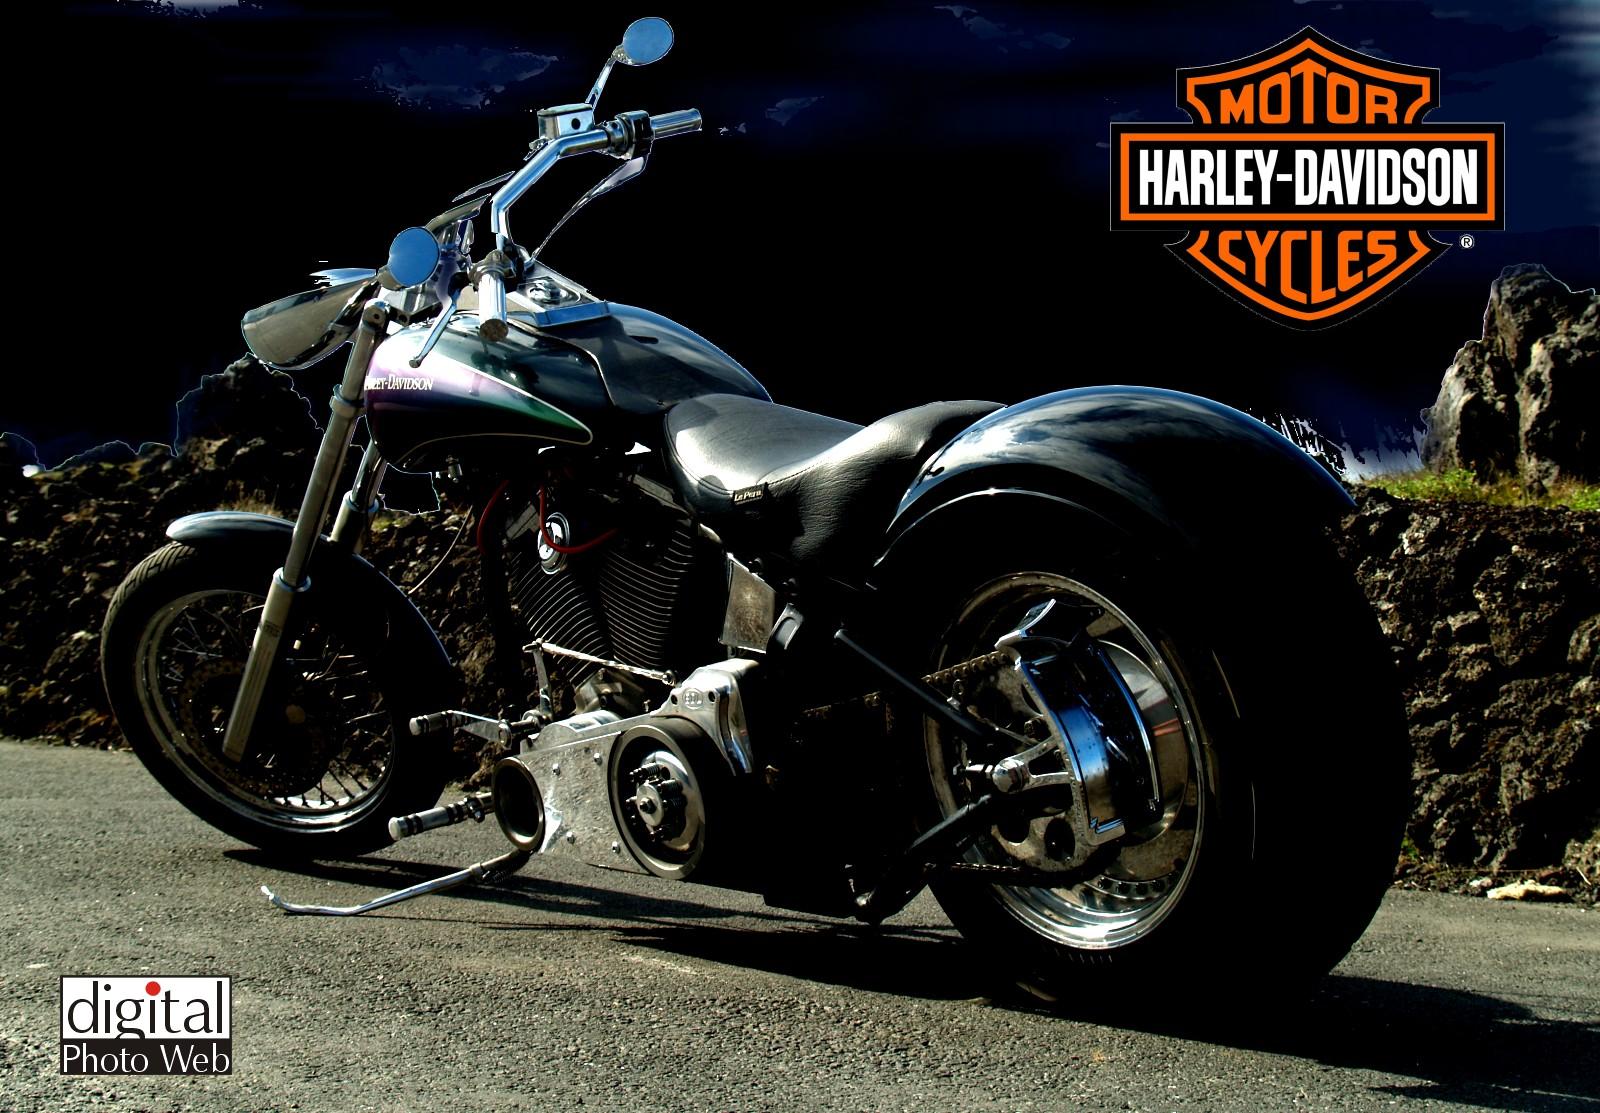 Harley Davidson Bikes Wallpapers HD Harley Davidson Bikes Wallpapers 1600x1113